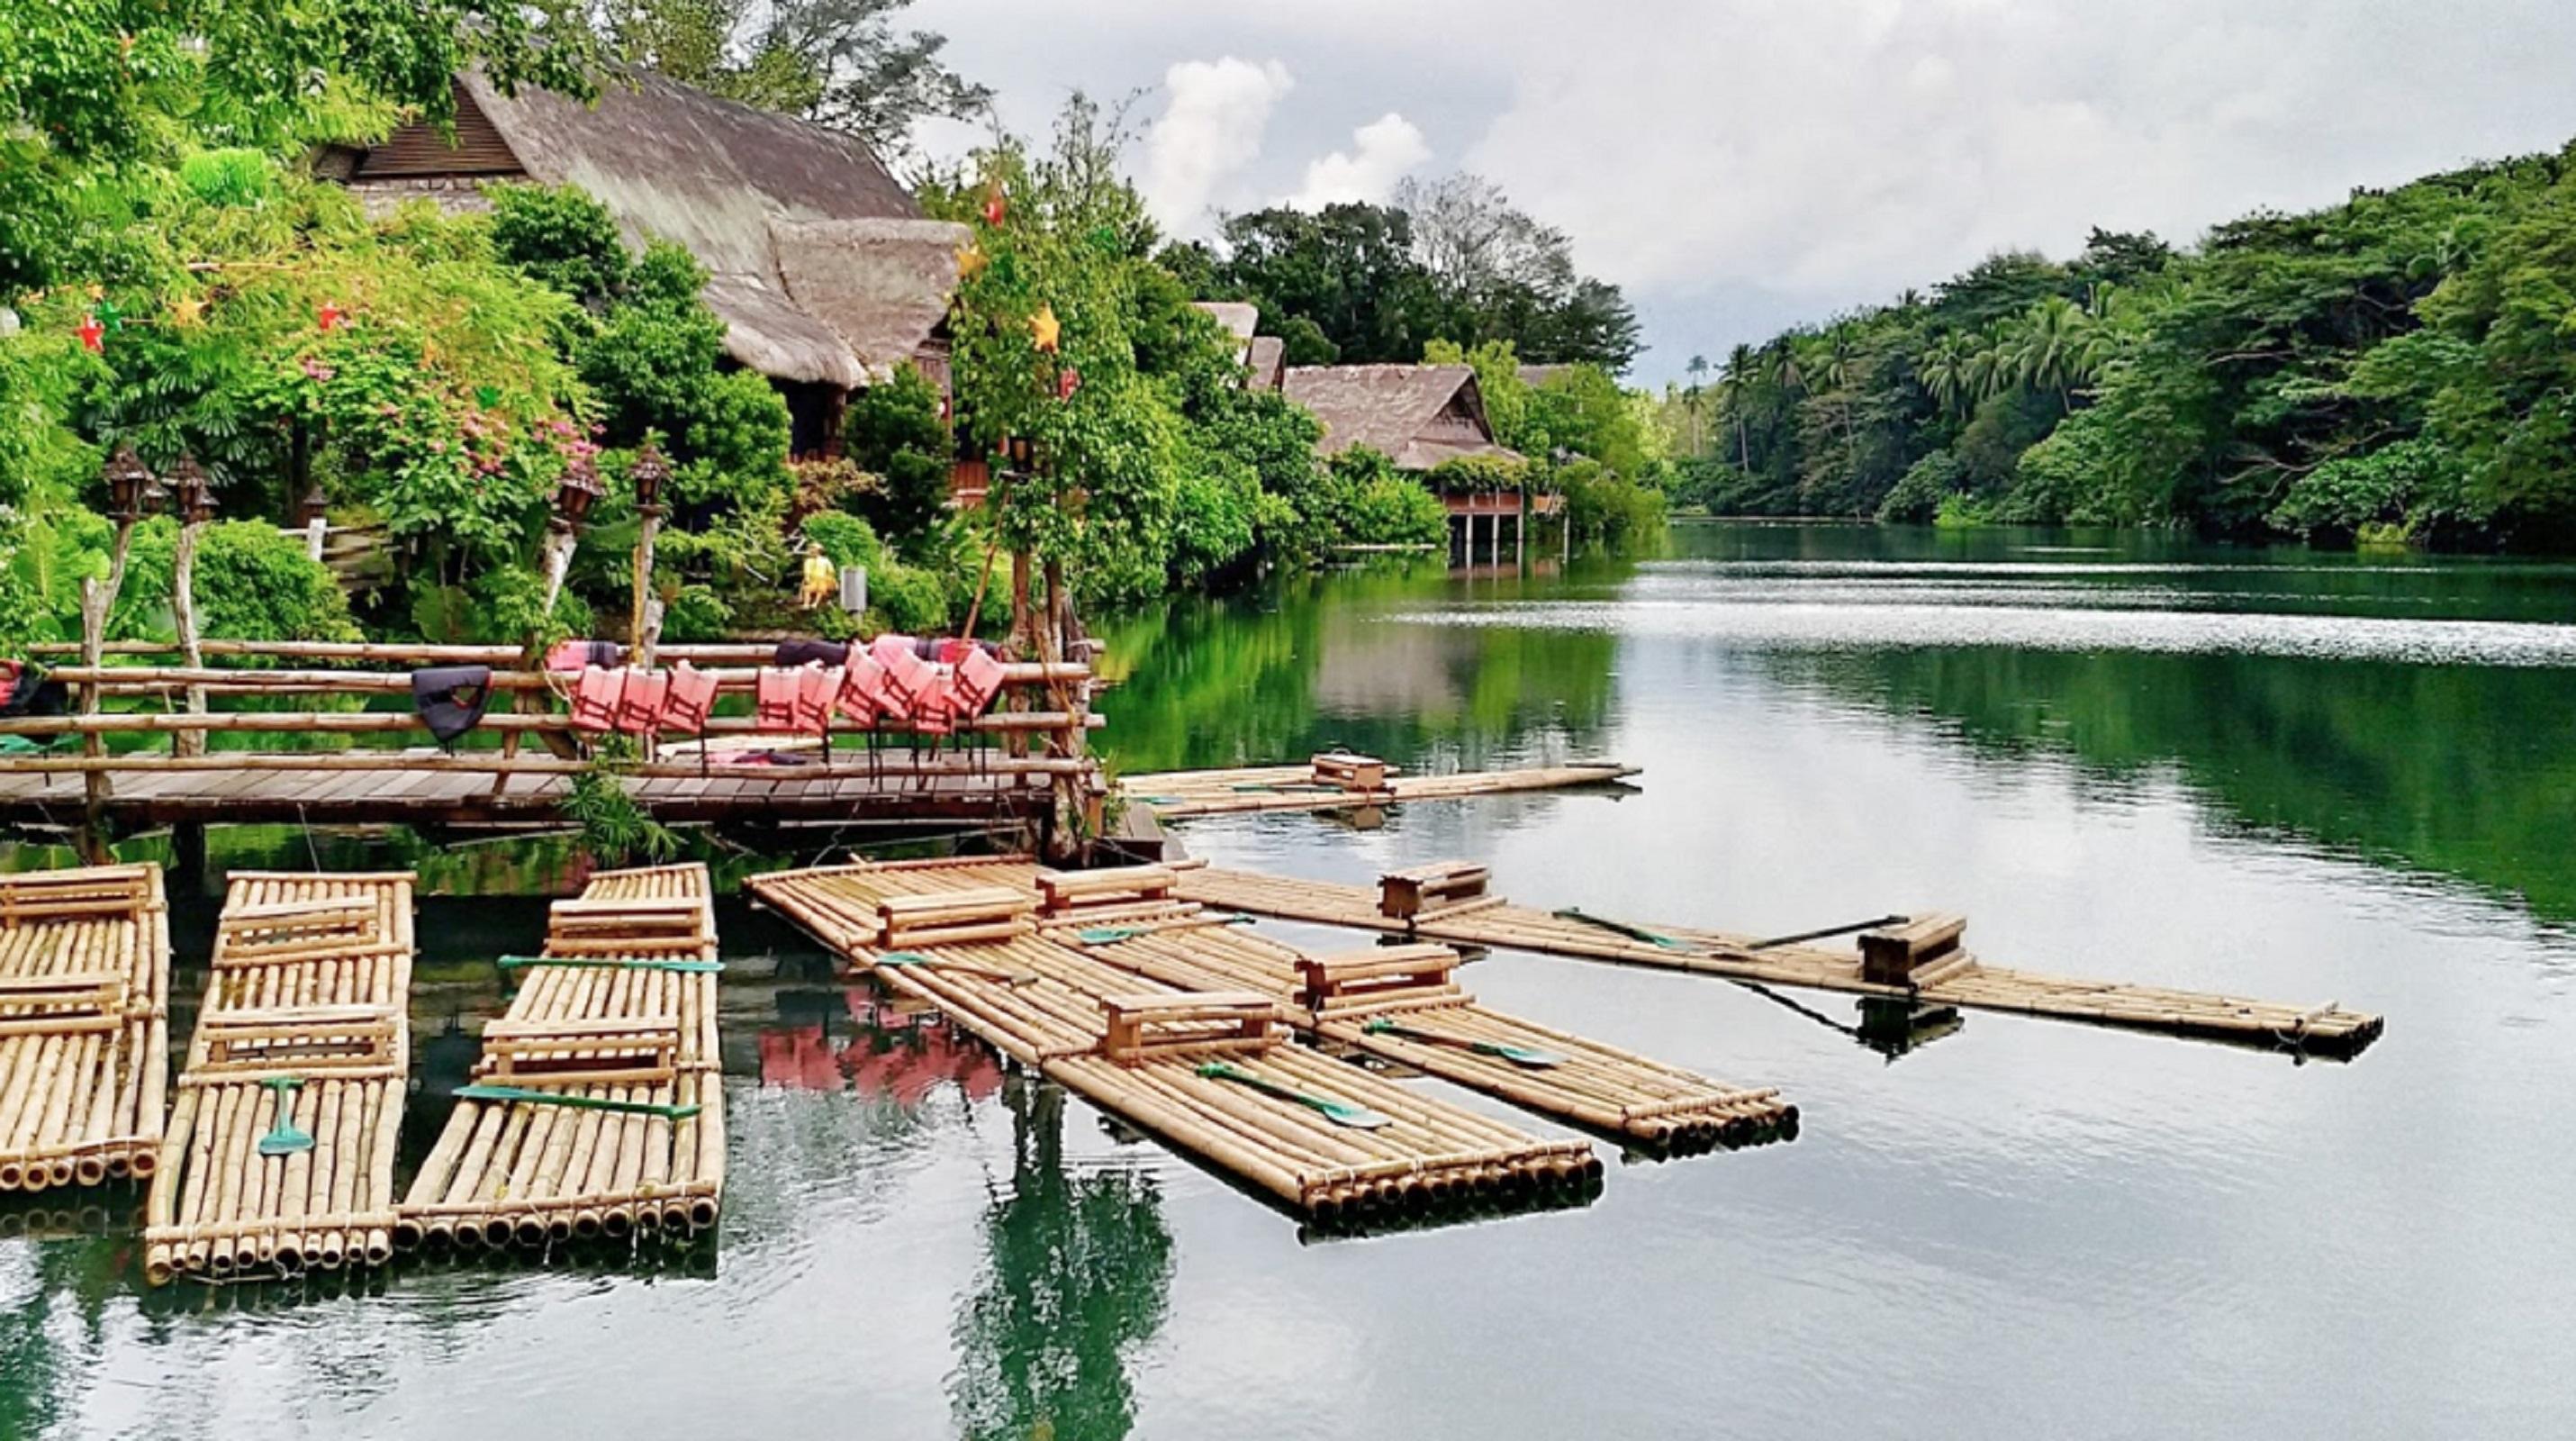 Villa Escudero Resort Quezon Day Tour | With Lunch & Transfers from Manila